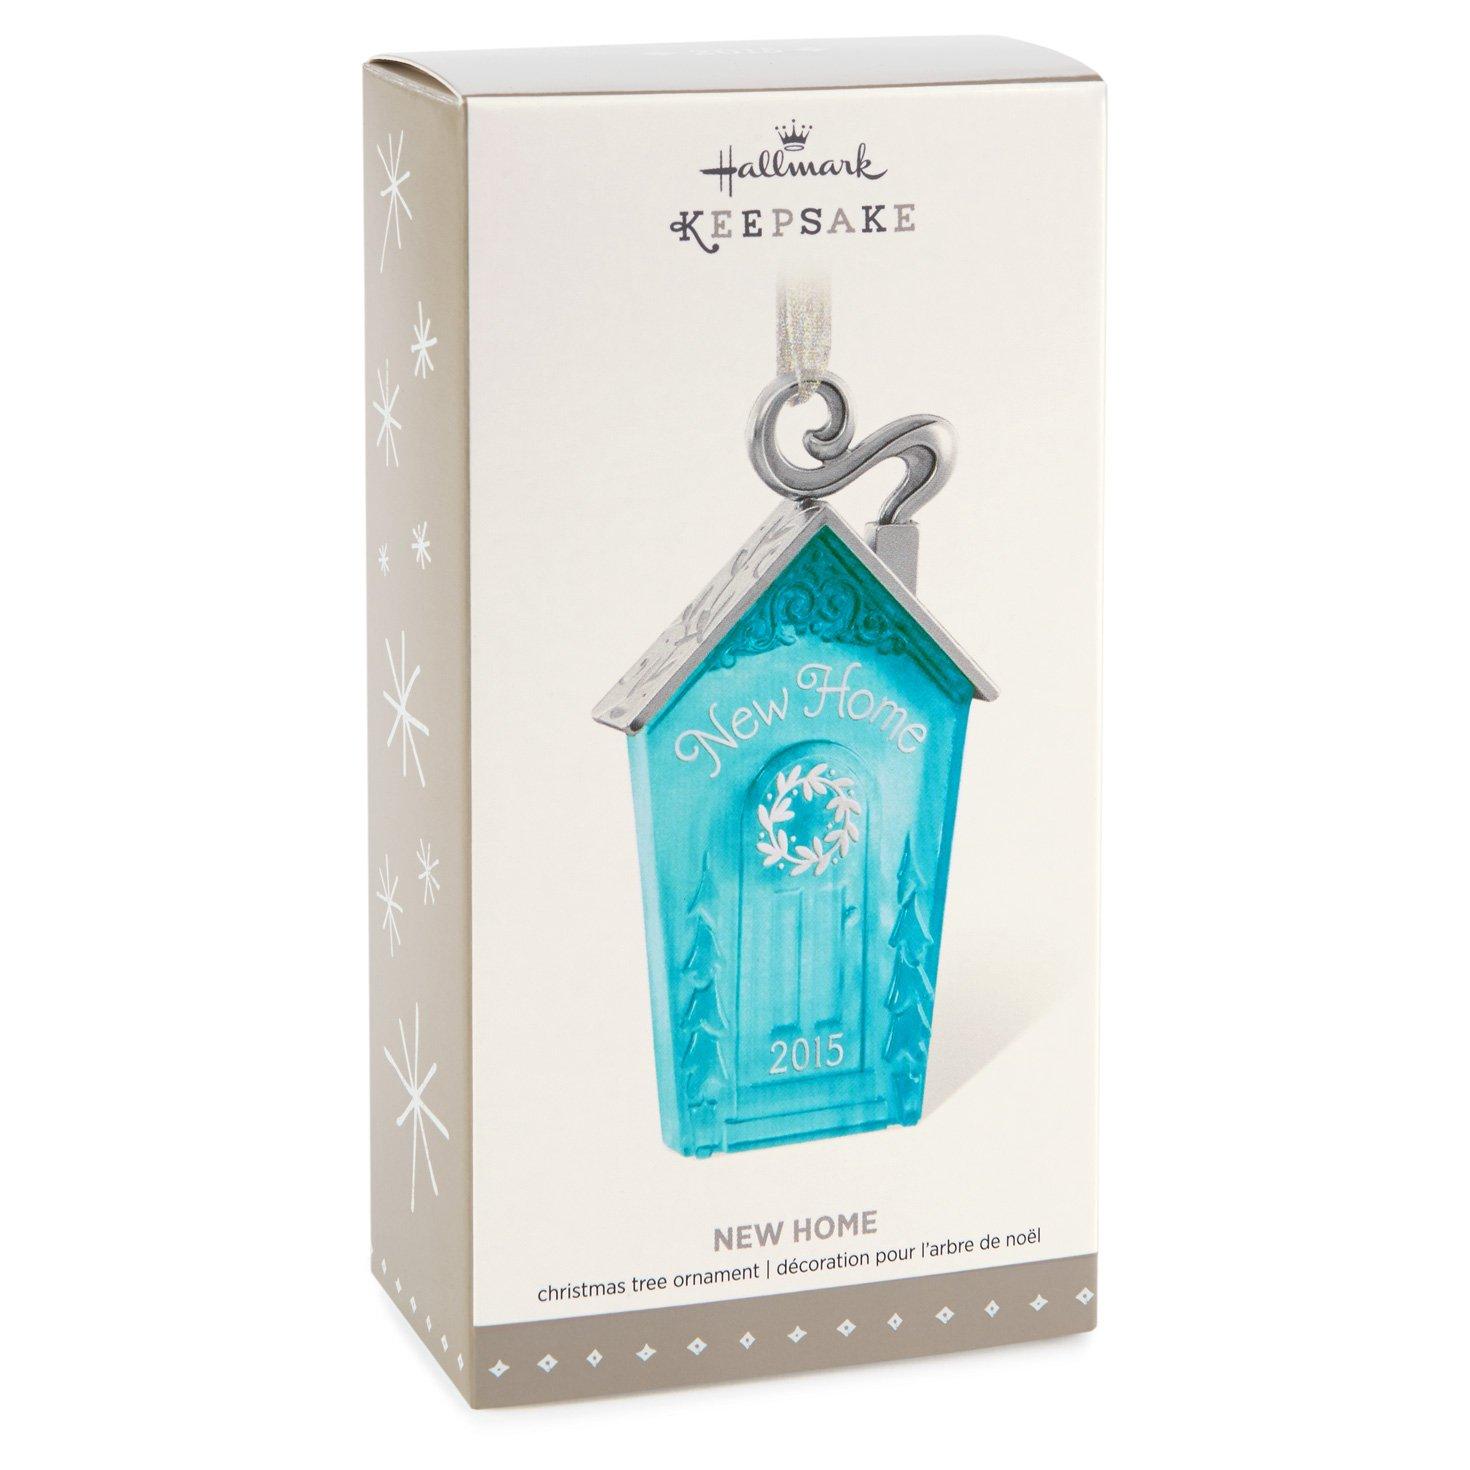 Amazoncom Hallmark Keepsake Ornament  New Home Home  Kitchen